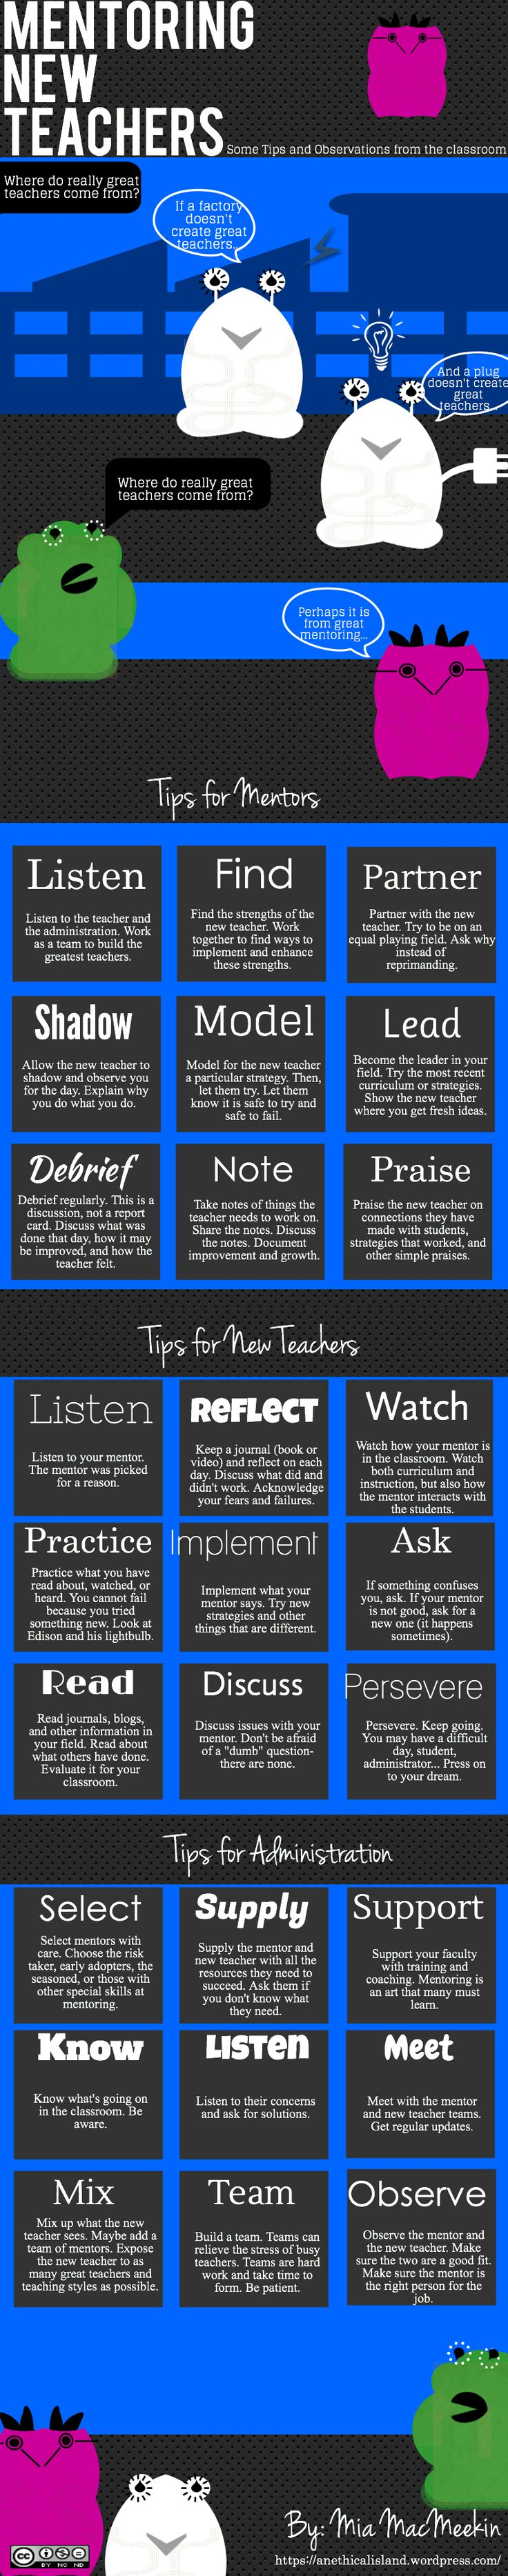 Ideas for mentoring new teachers in an infographic. | Teacher leadership, Instructional leadership, Coaching teachers